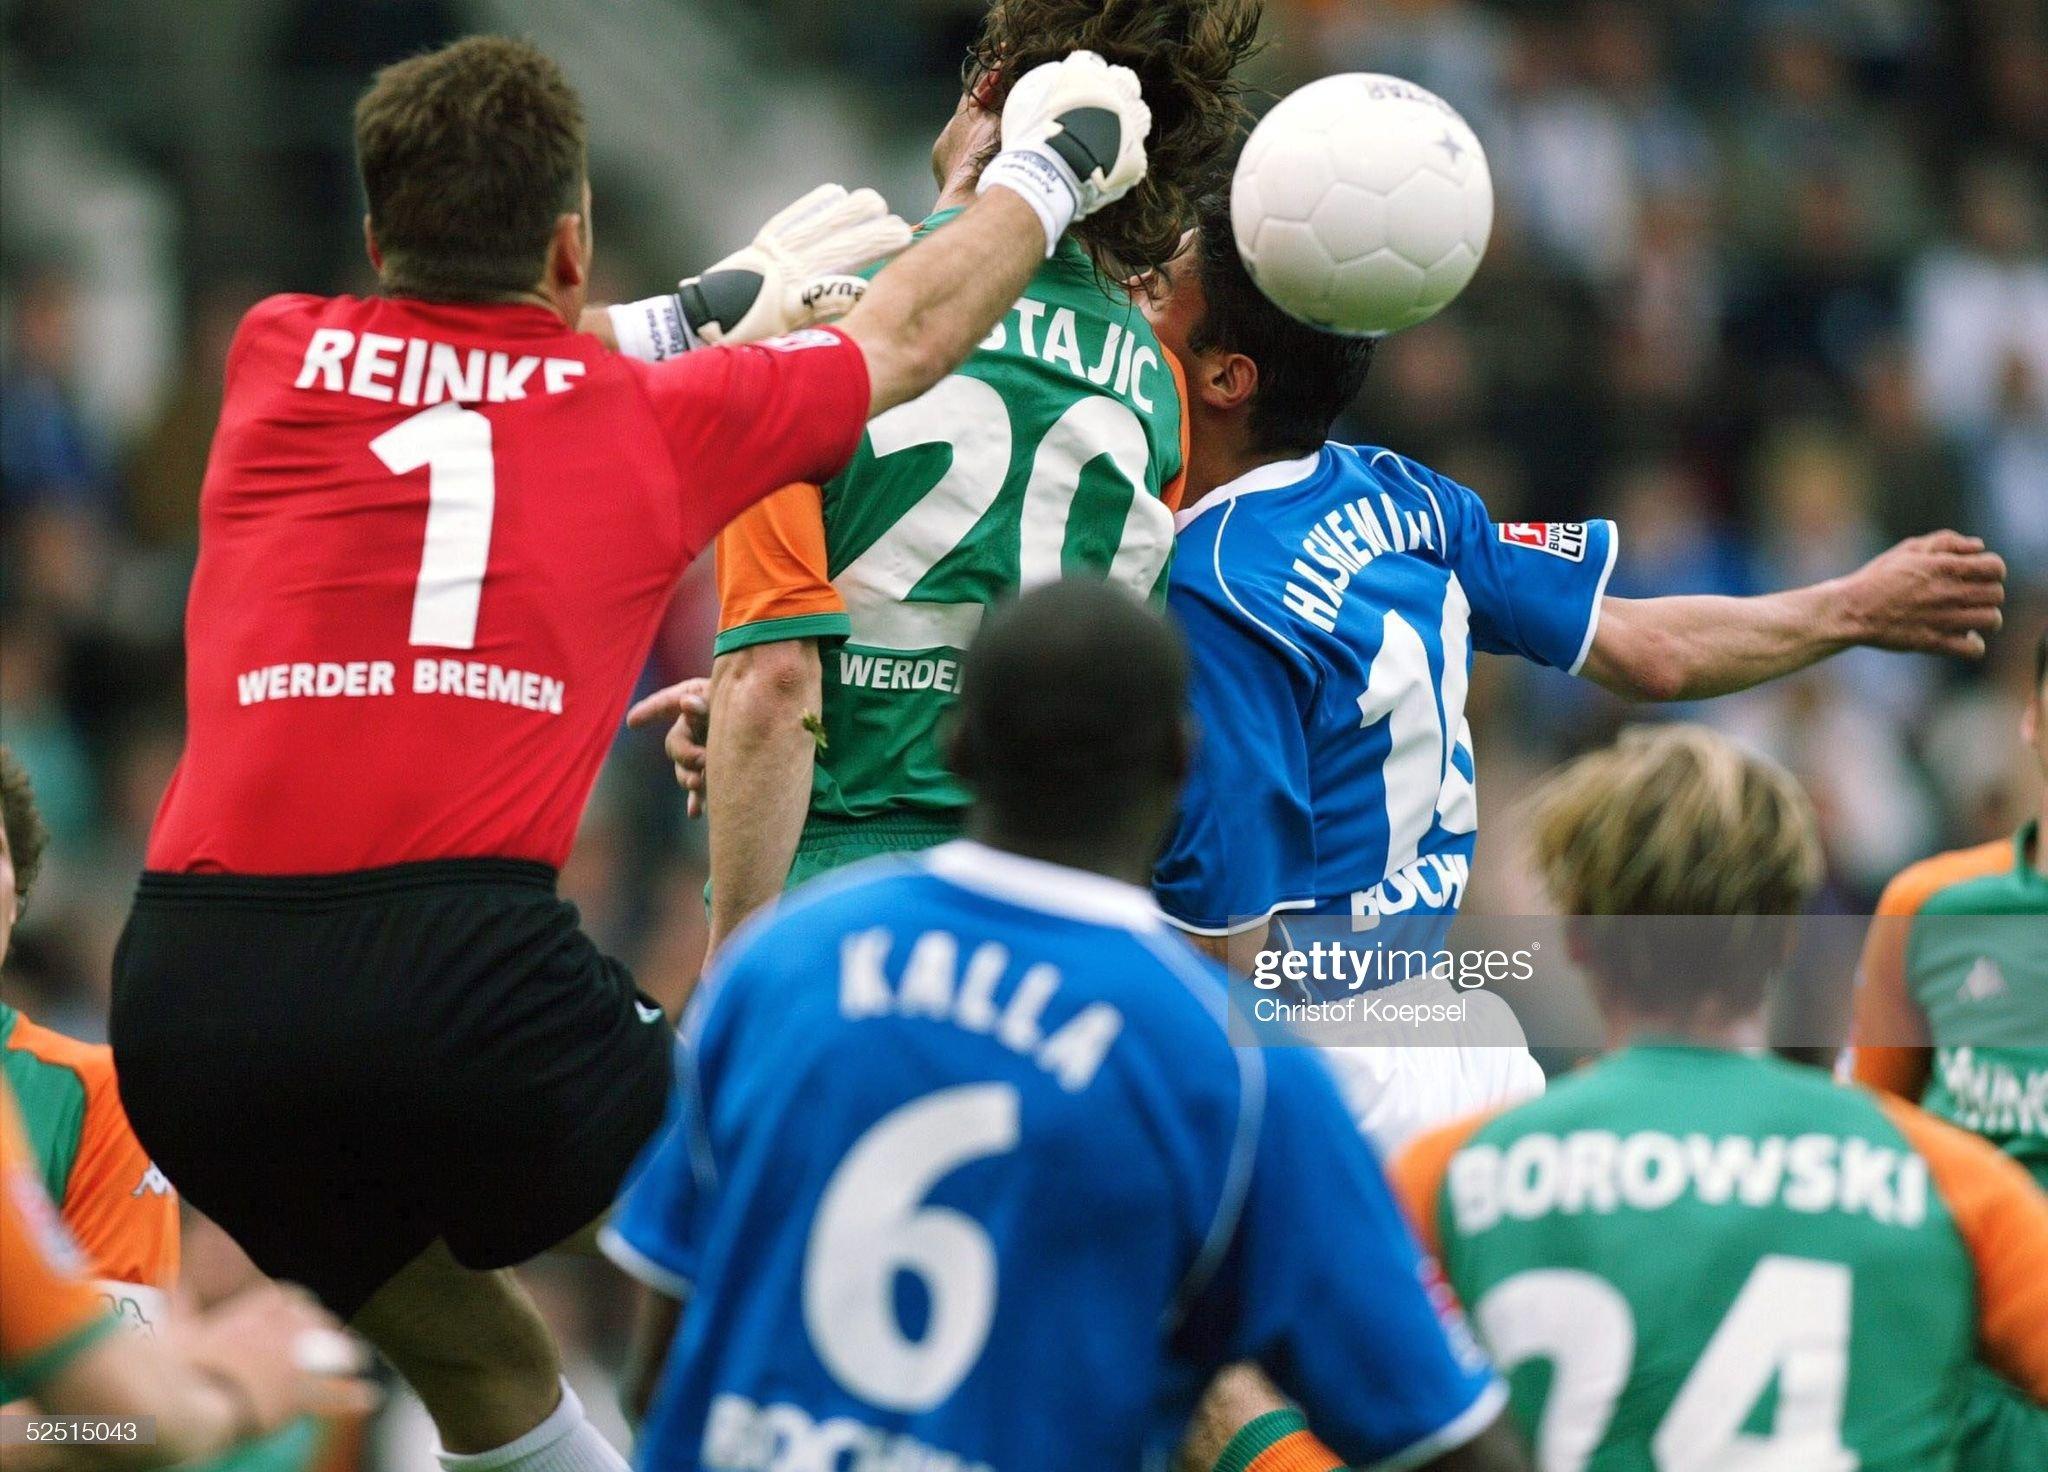 fussball-1-bundesliga-0304-bochum-vfl-bochum-sv-werder-bremen-00-picture-id52515043?s=2048x2048